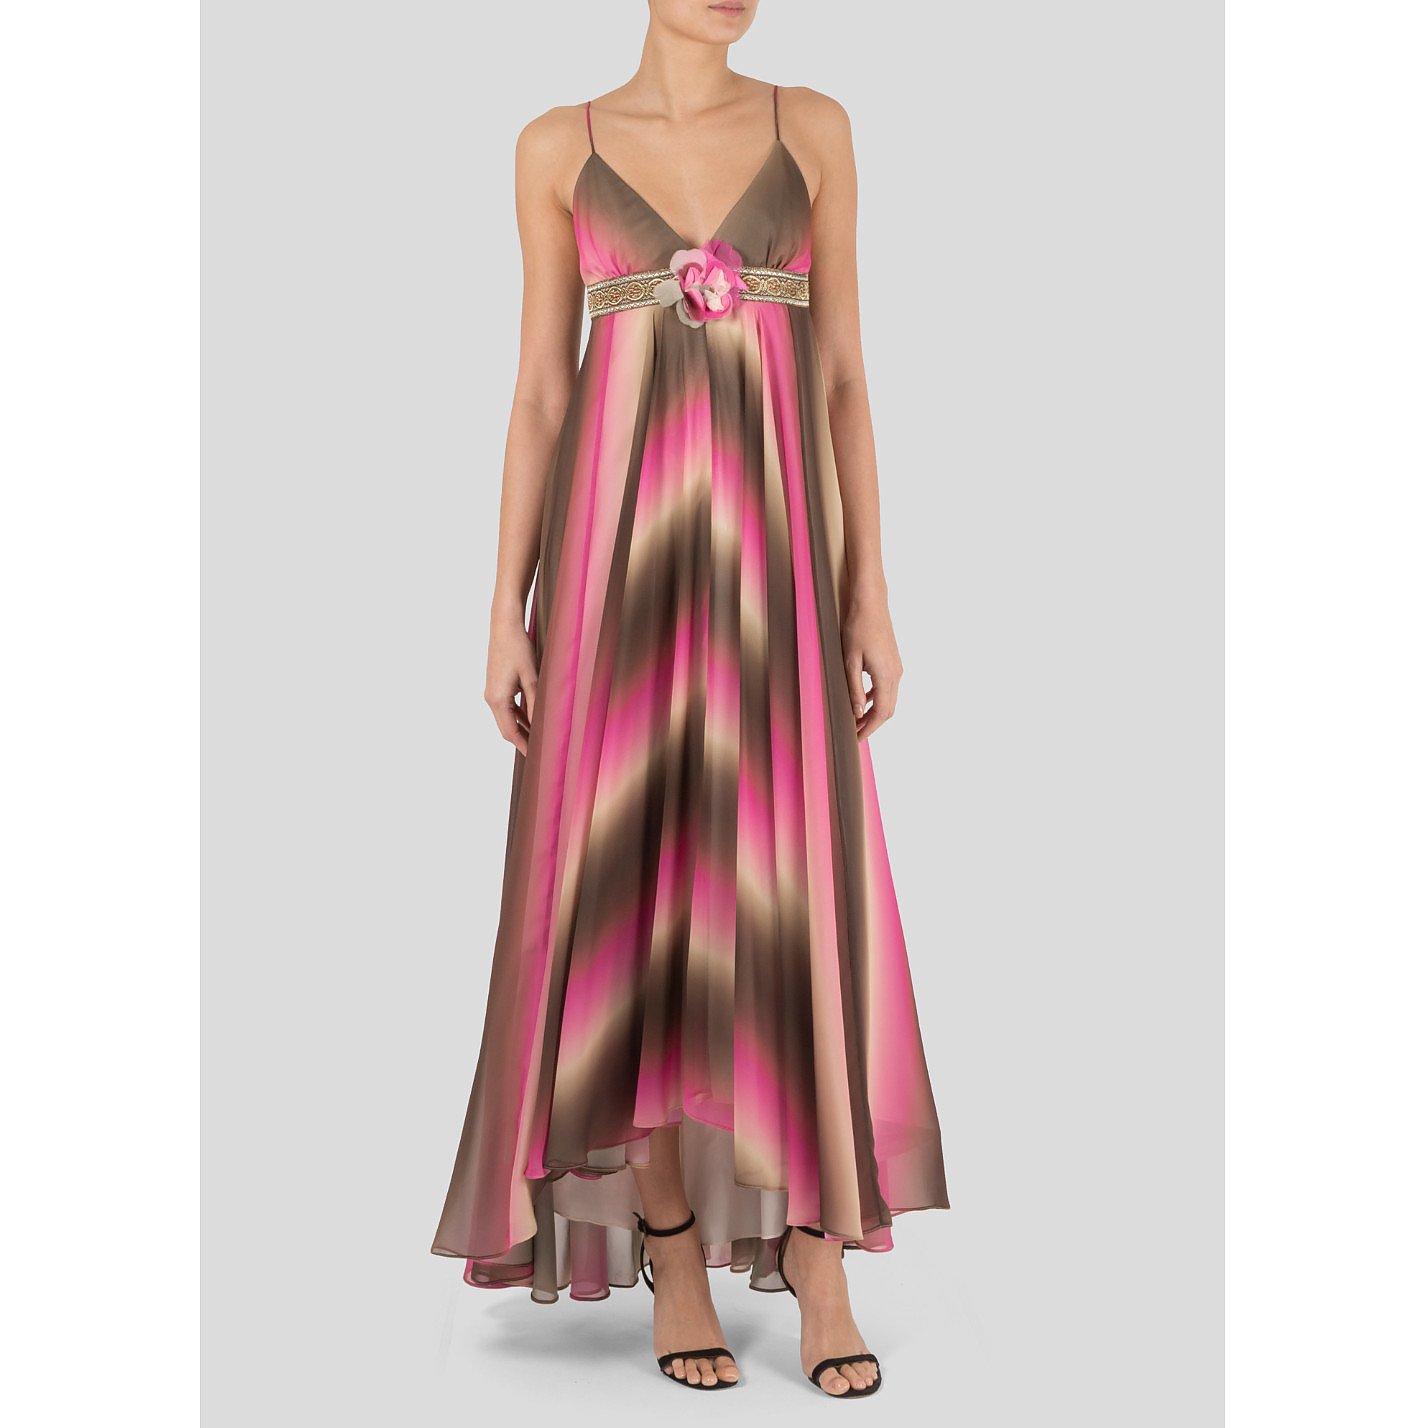 Matthew Williamson Sleeveless Printed Gown